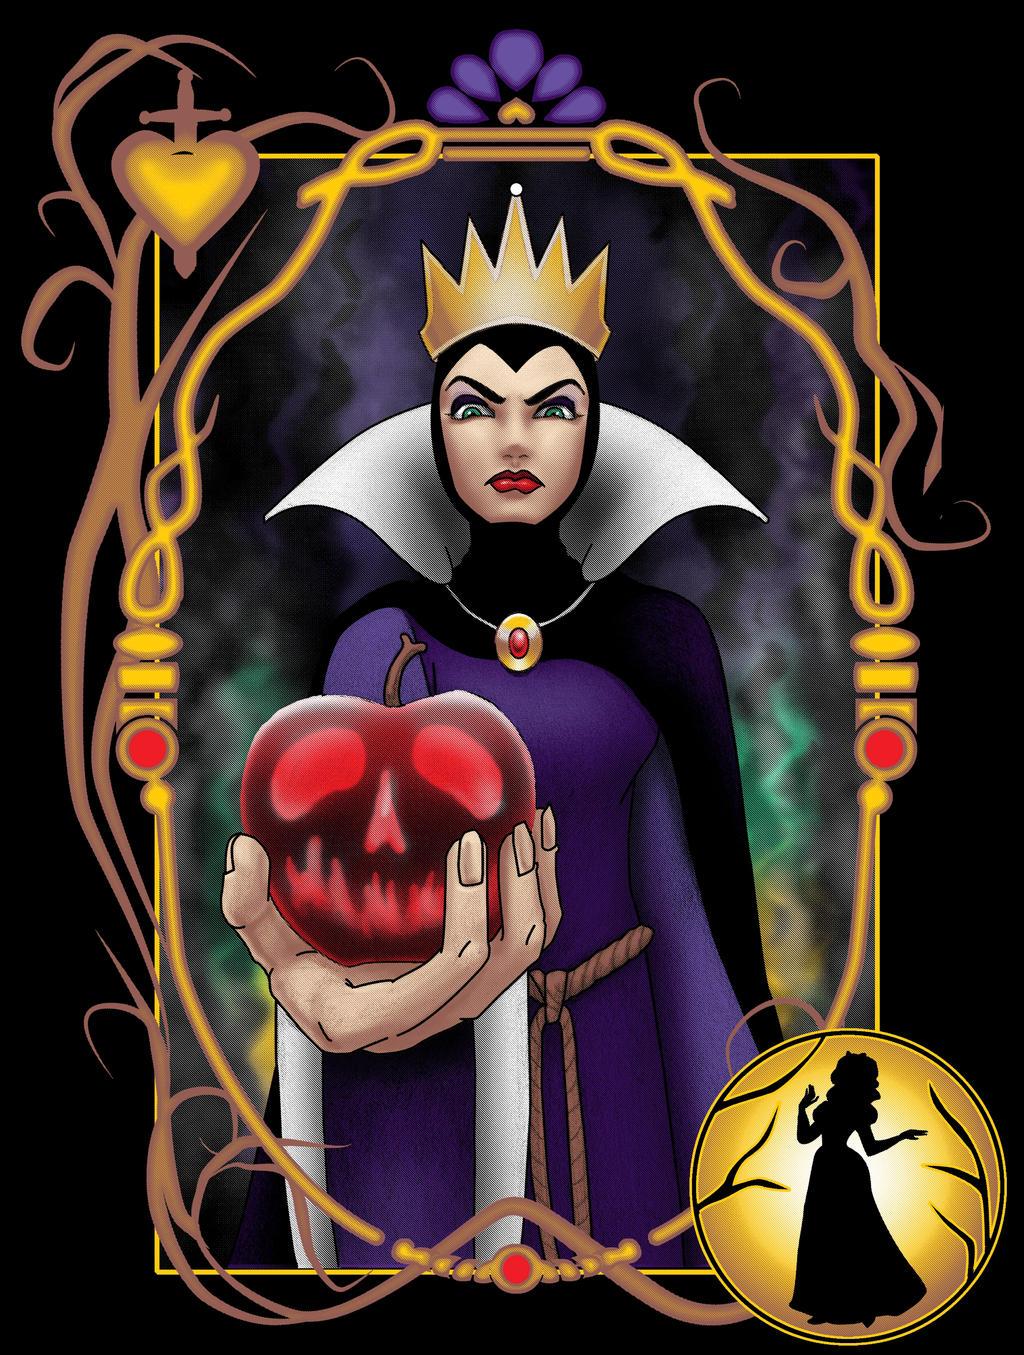 Full of Wicked Wiles by paxdomino on DeviantArtDisney Evil Queen Art